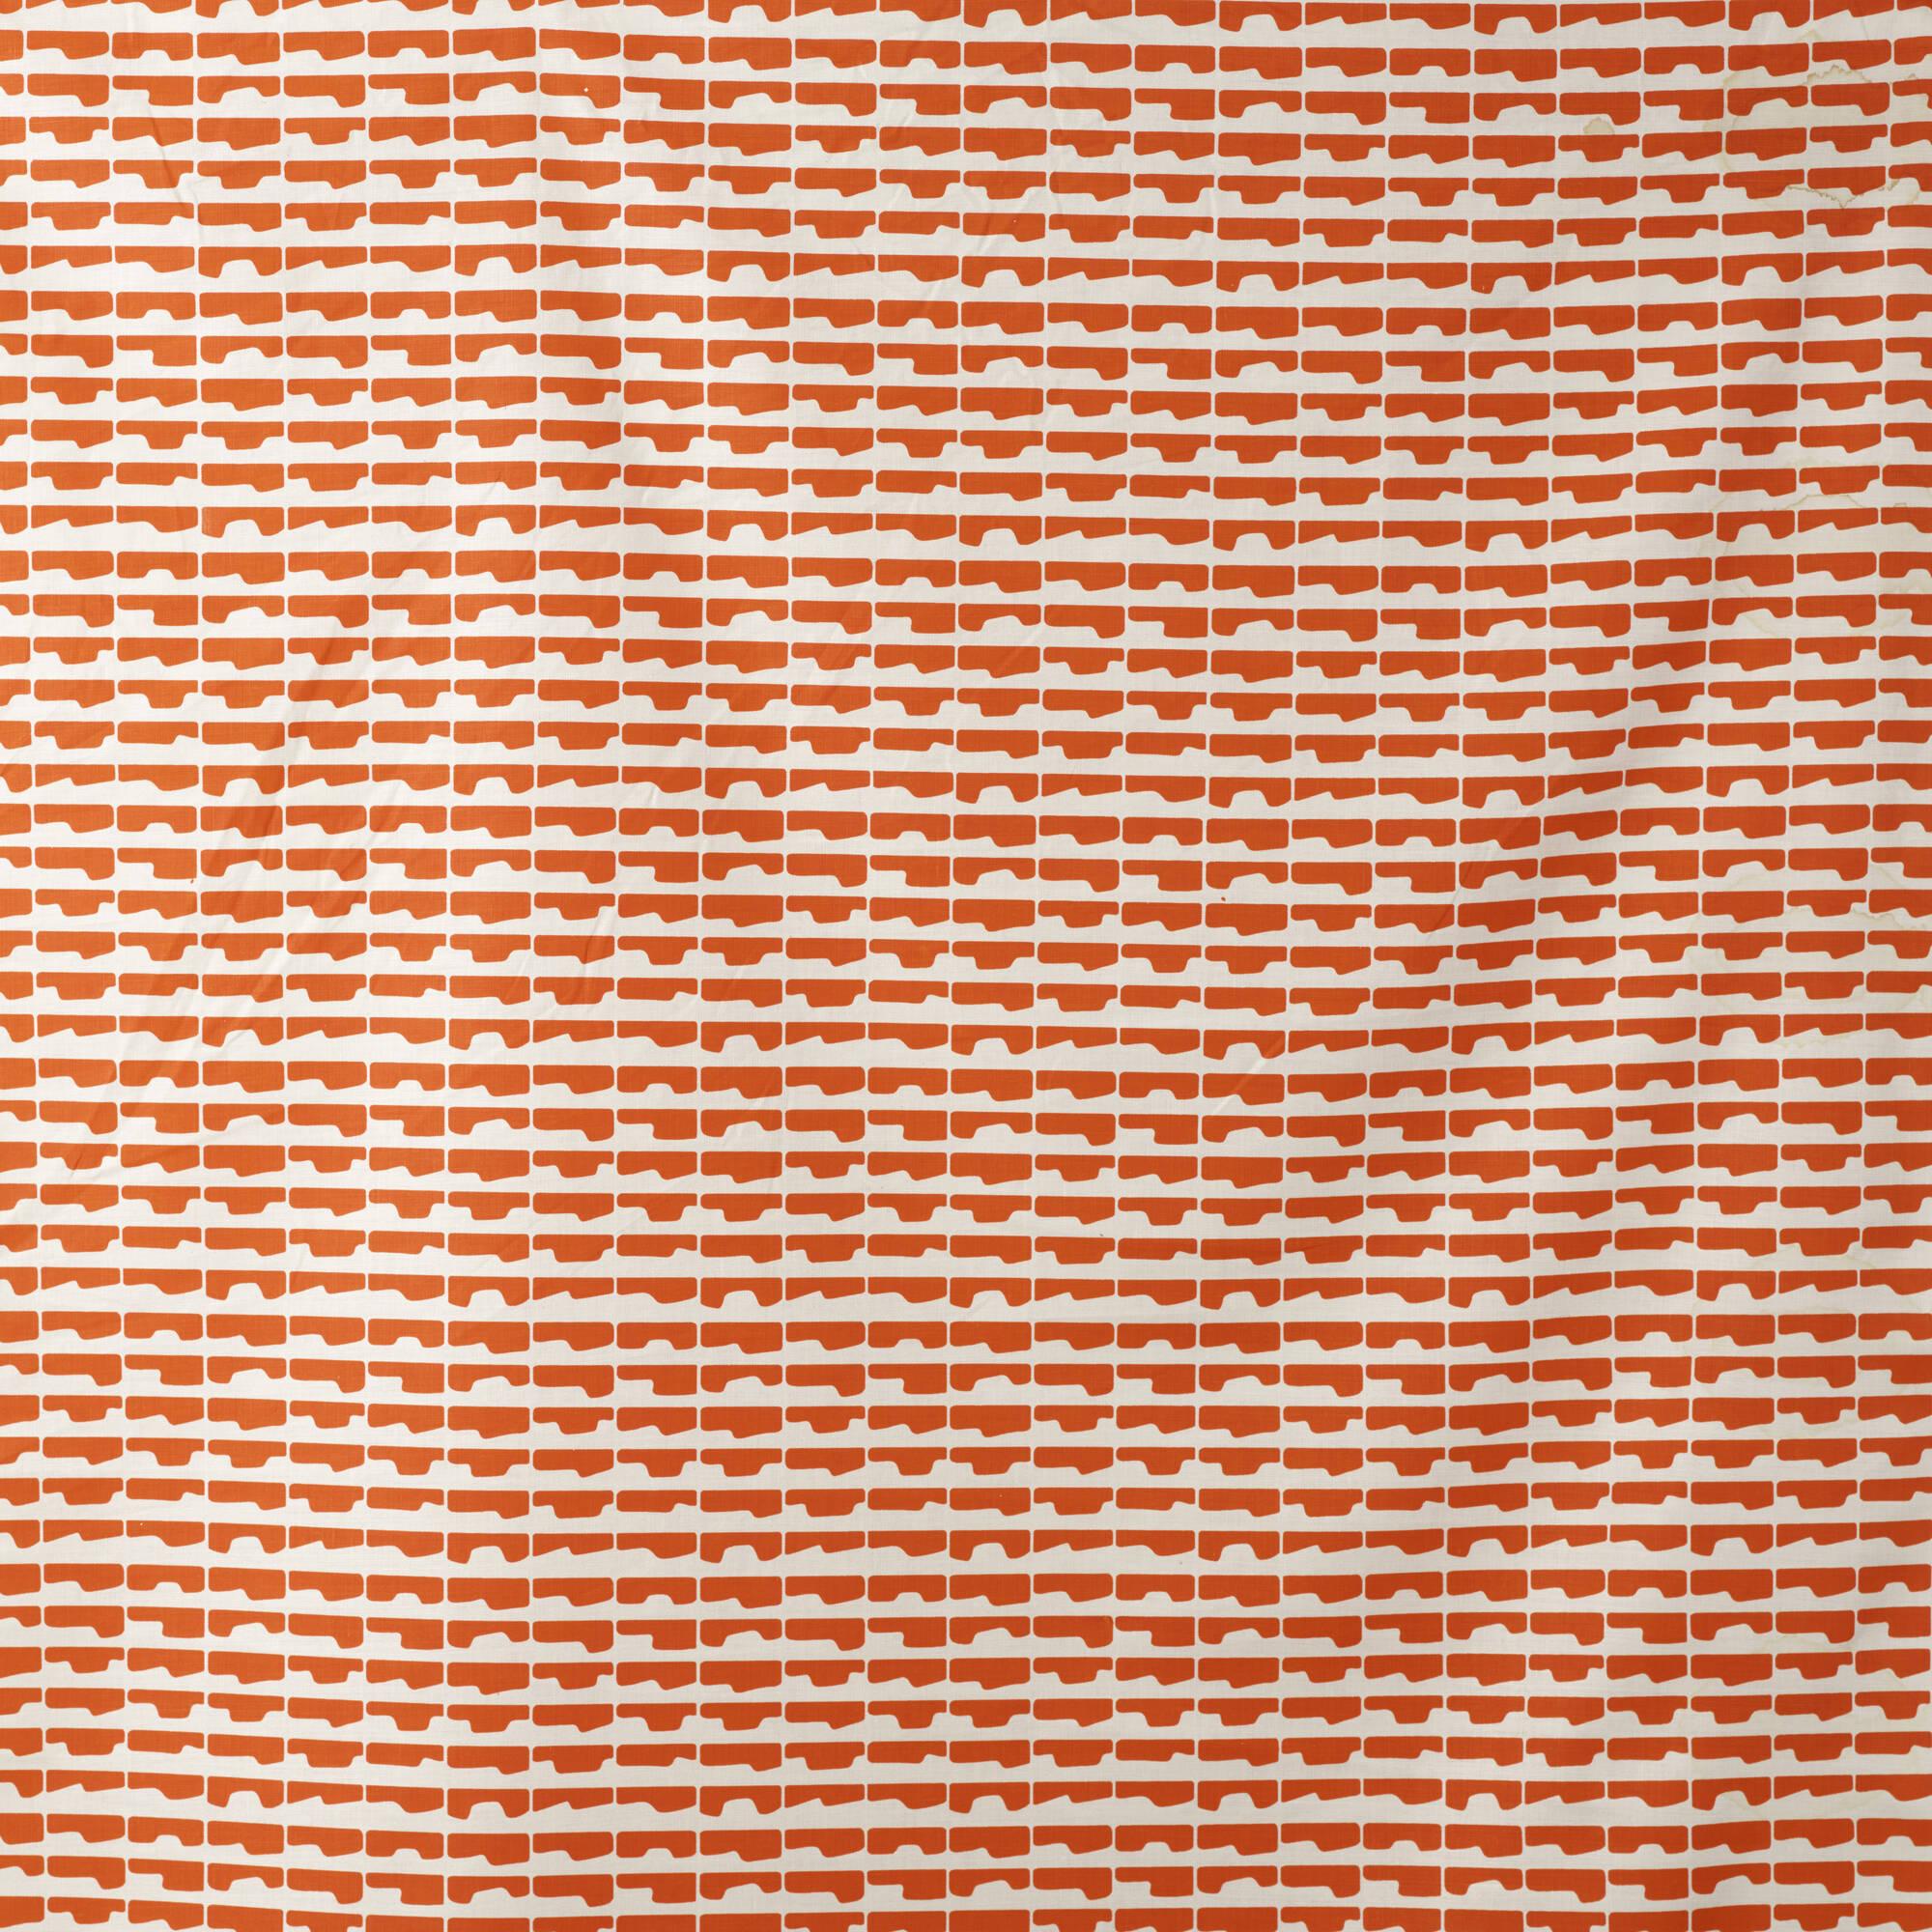 136: Angelo Testa / fabric (1 of 1)